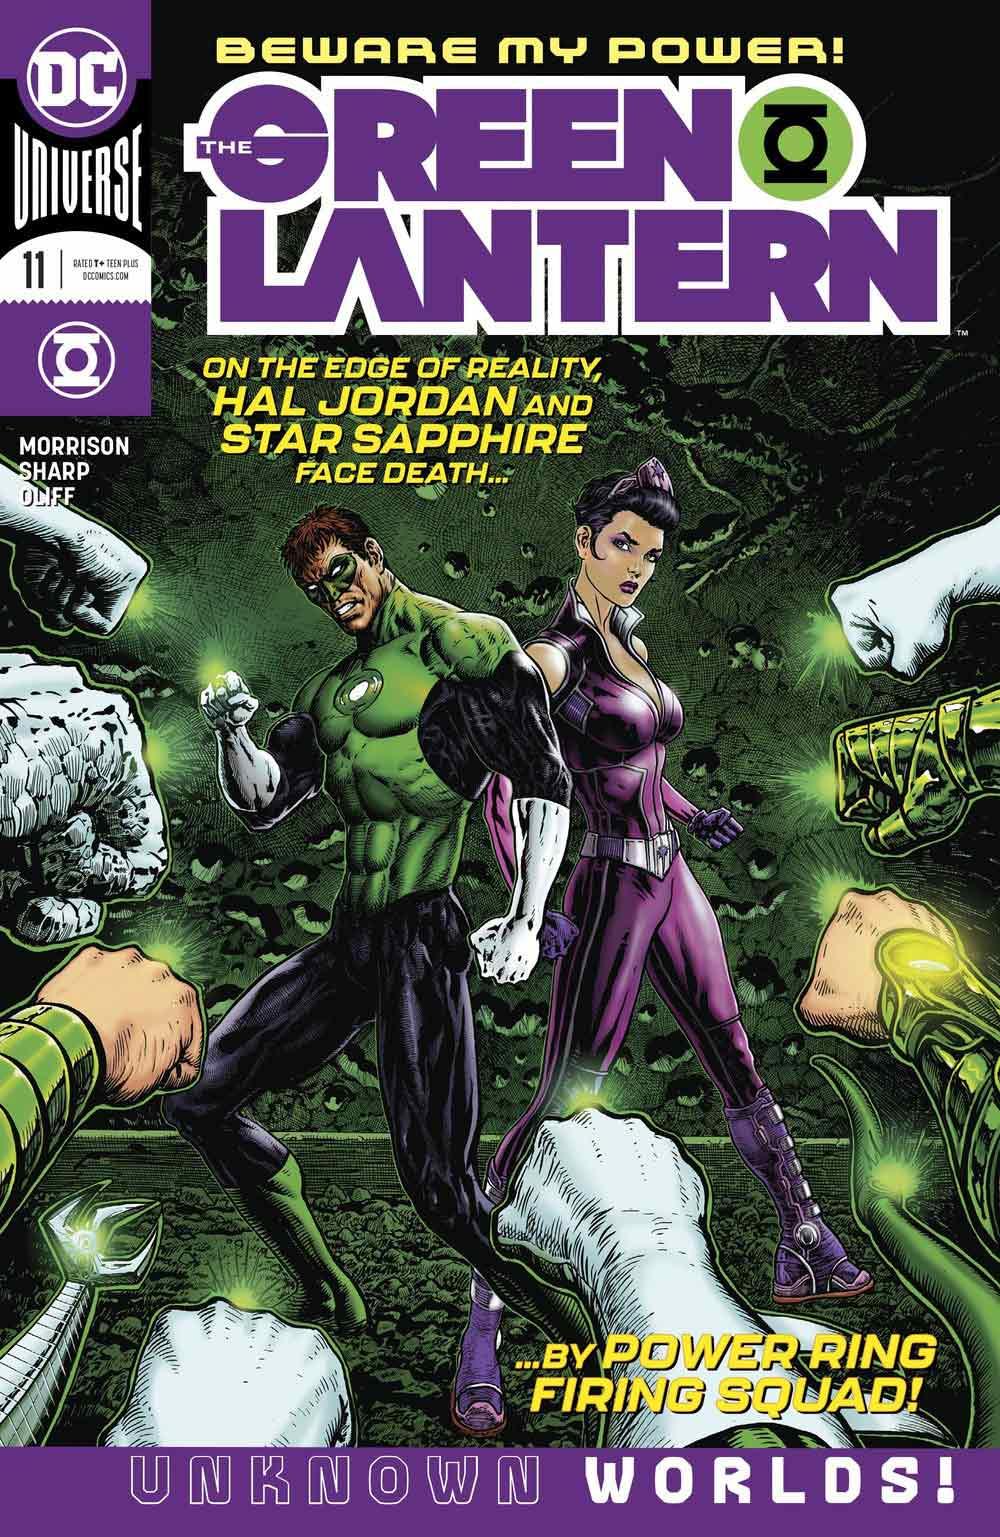 The Green lantern 11